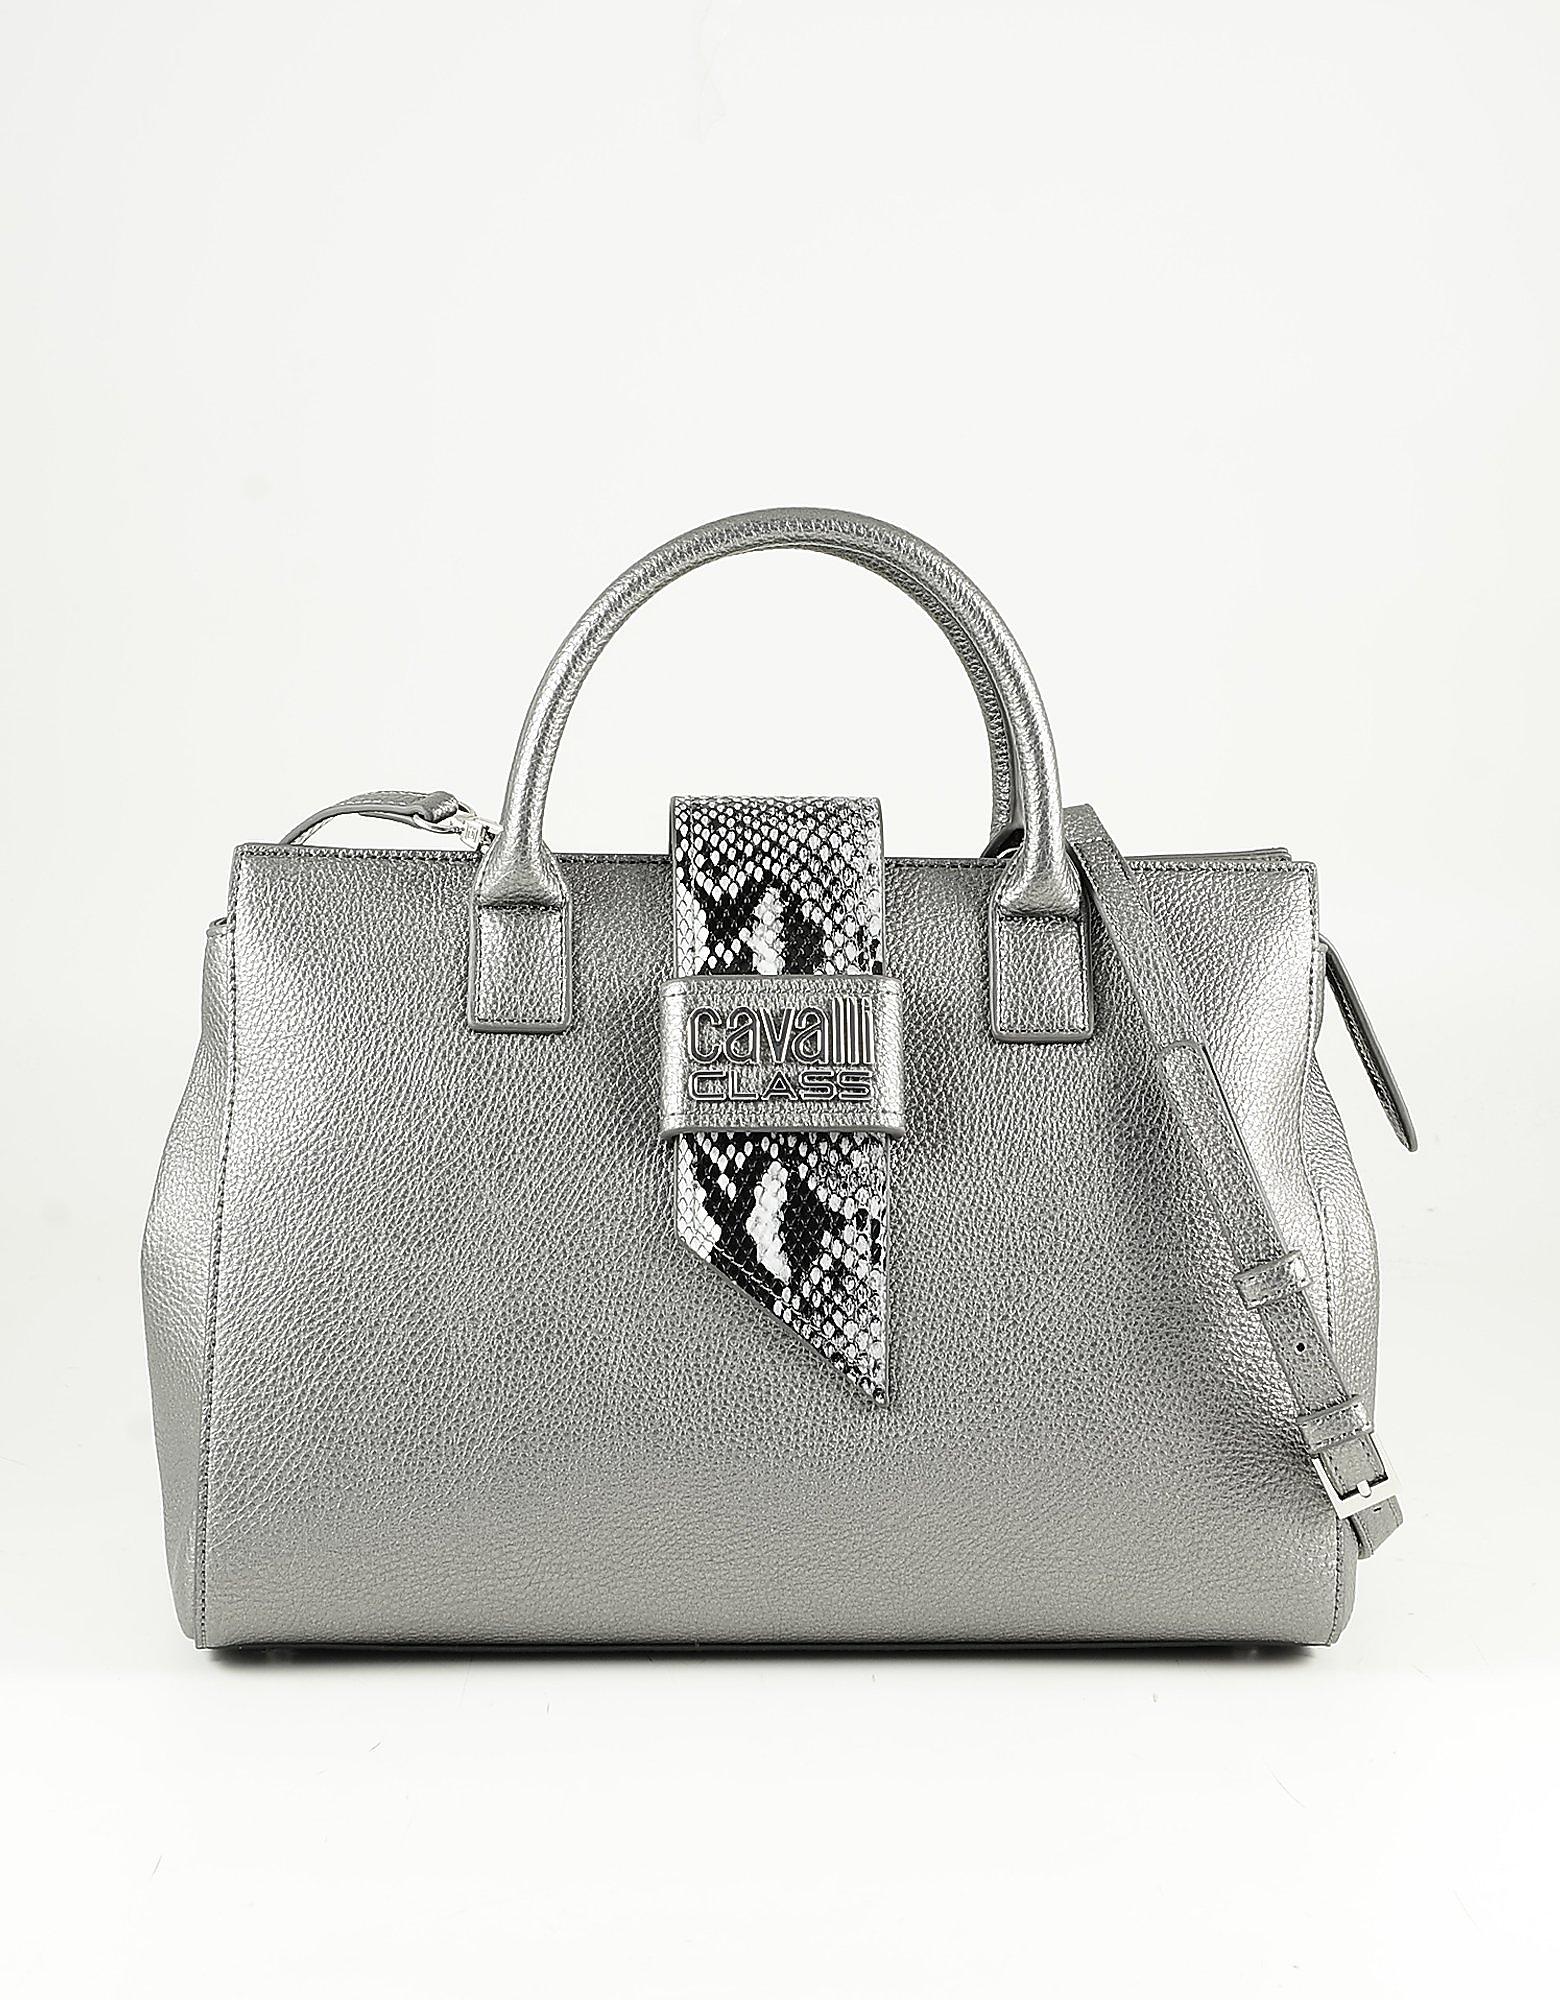 Class Roberto Cavalli Metallic Anthracite Eco-leather Satchel Bag In Gray